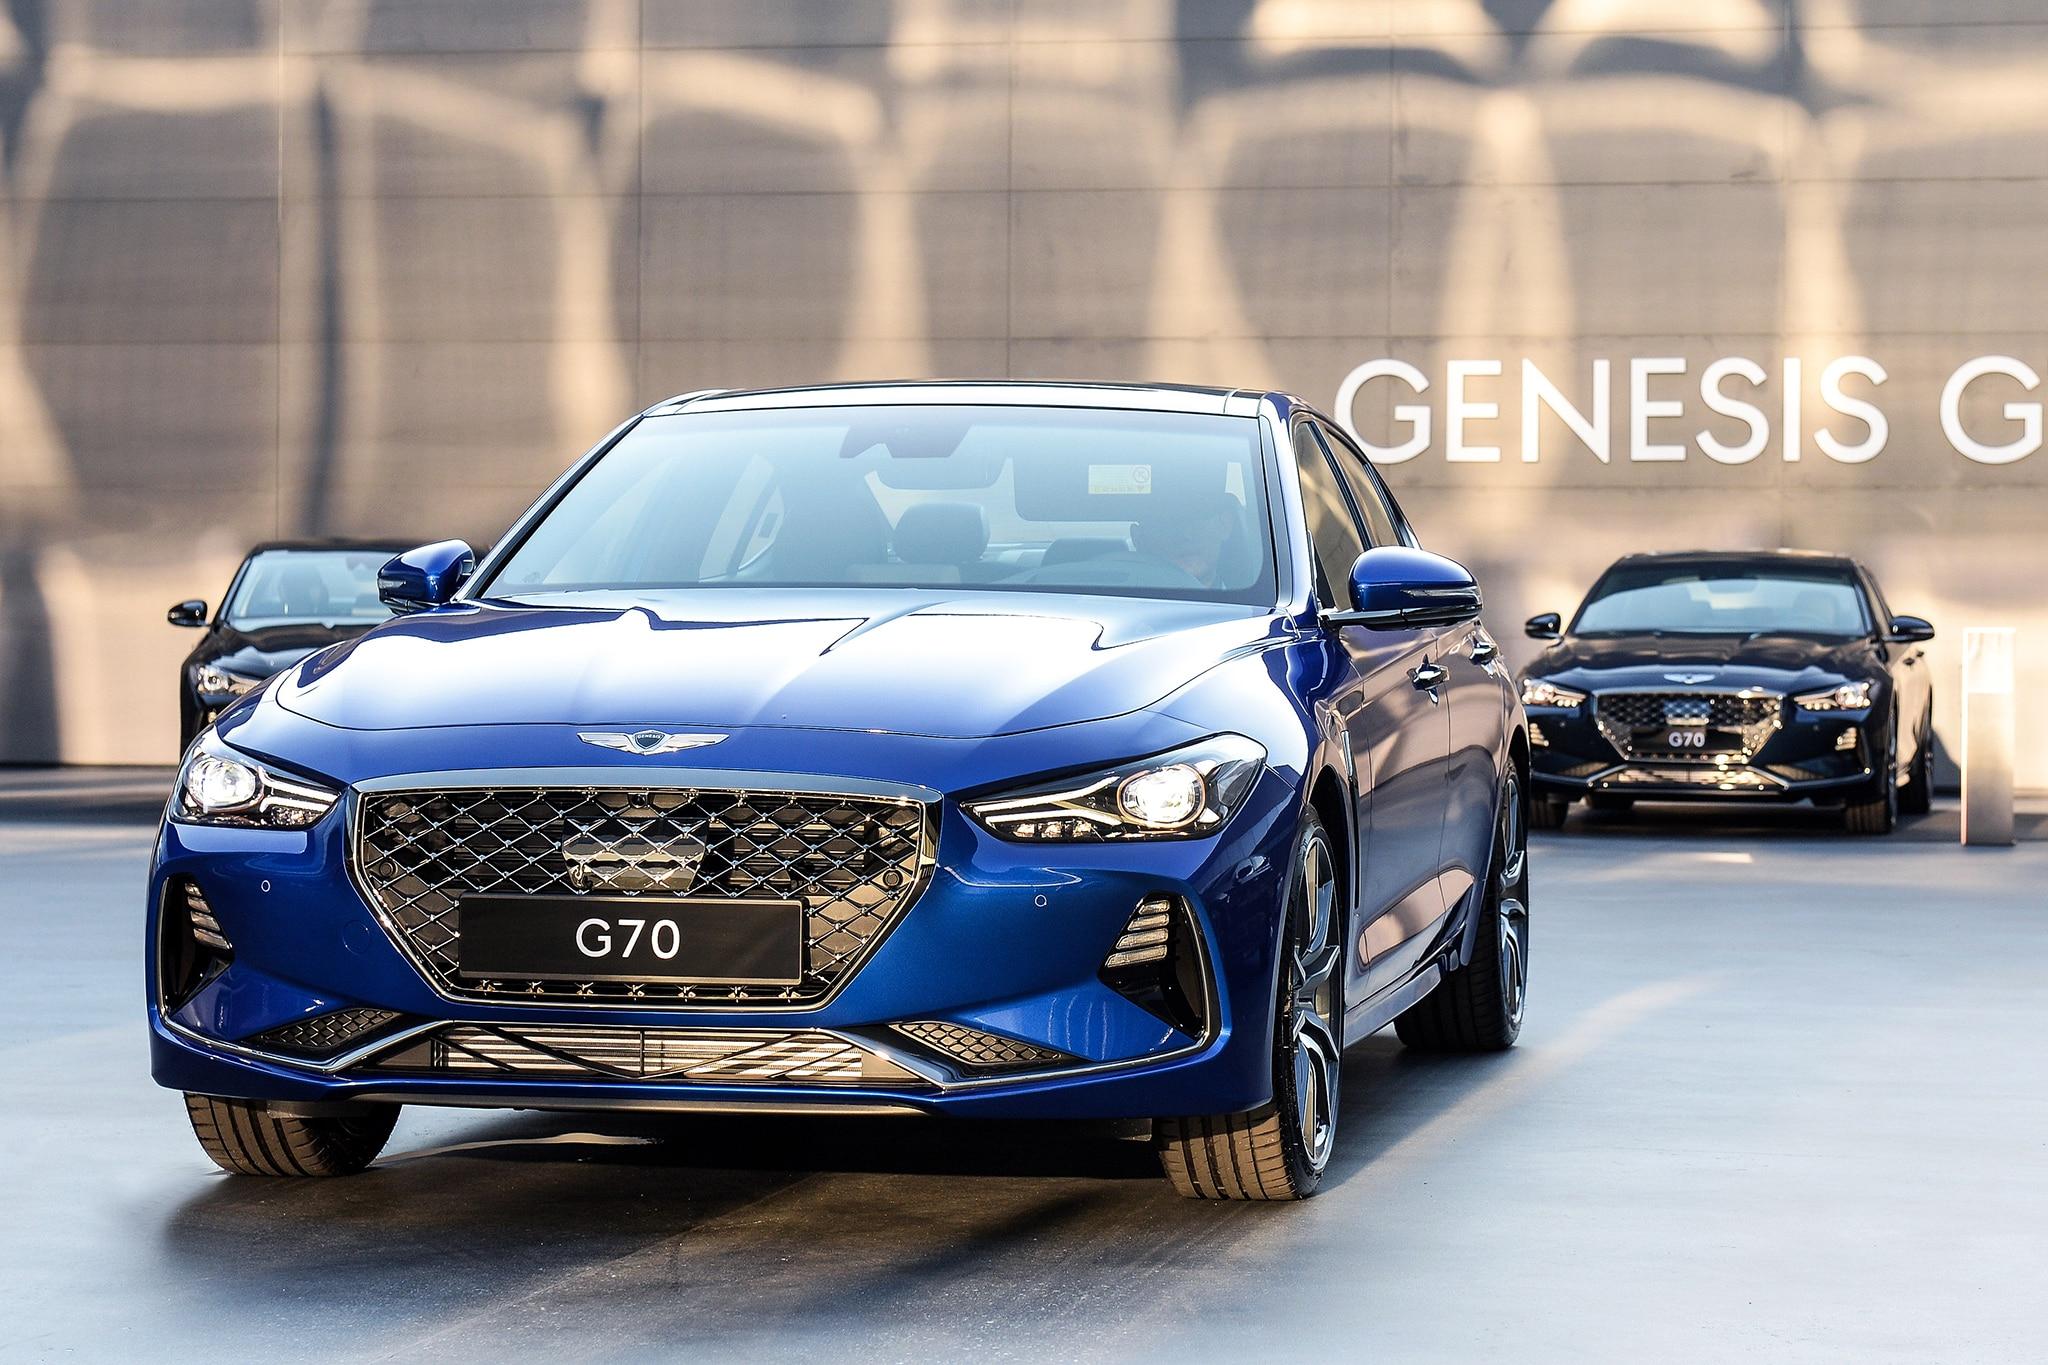 2019 Genesis G70 Front Three Quarter 04